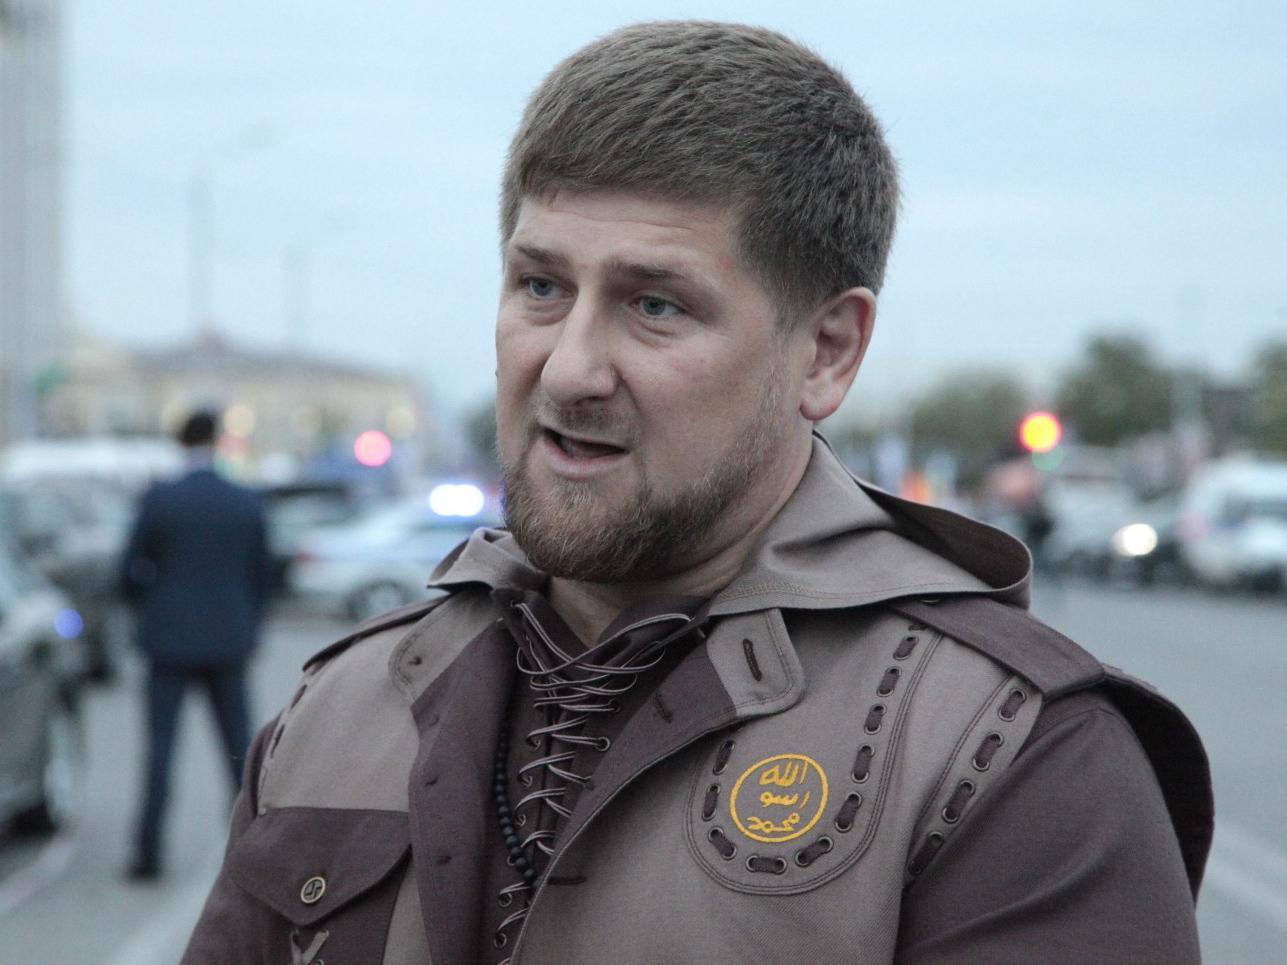 Chechen regional leader Ramzan Kadyrov